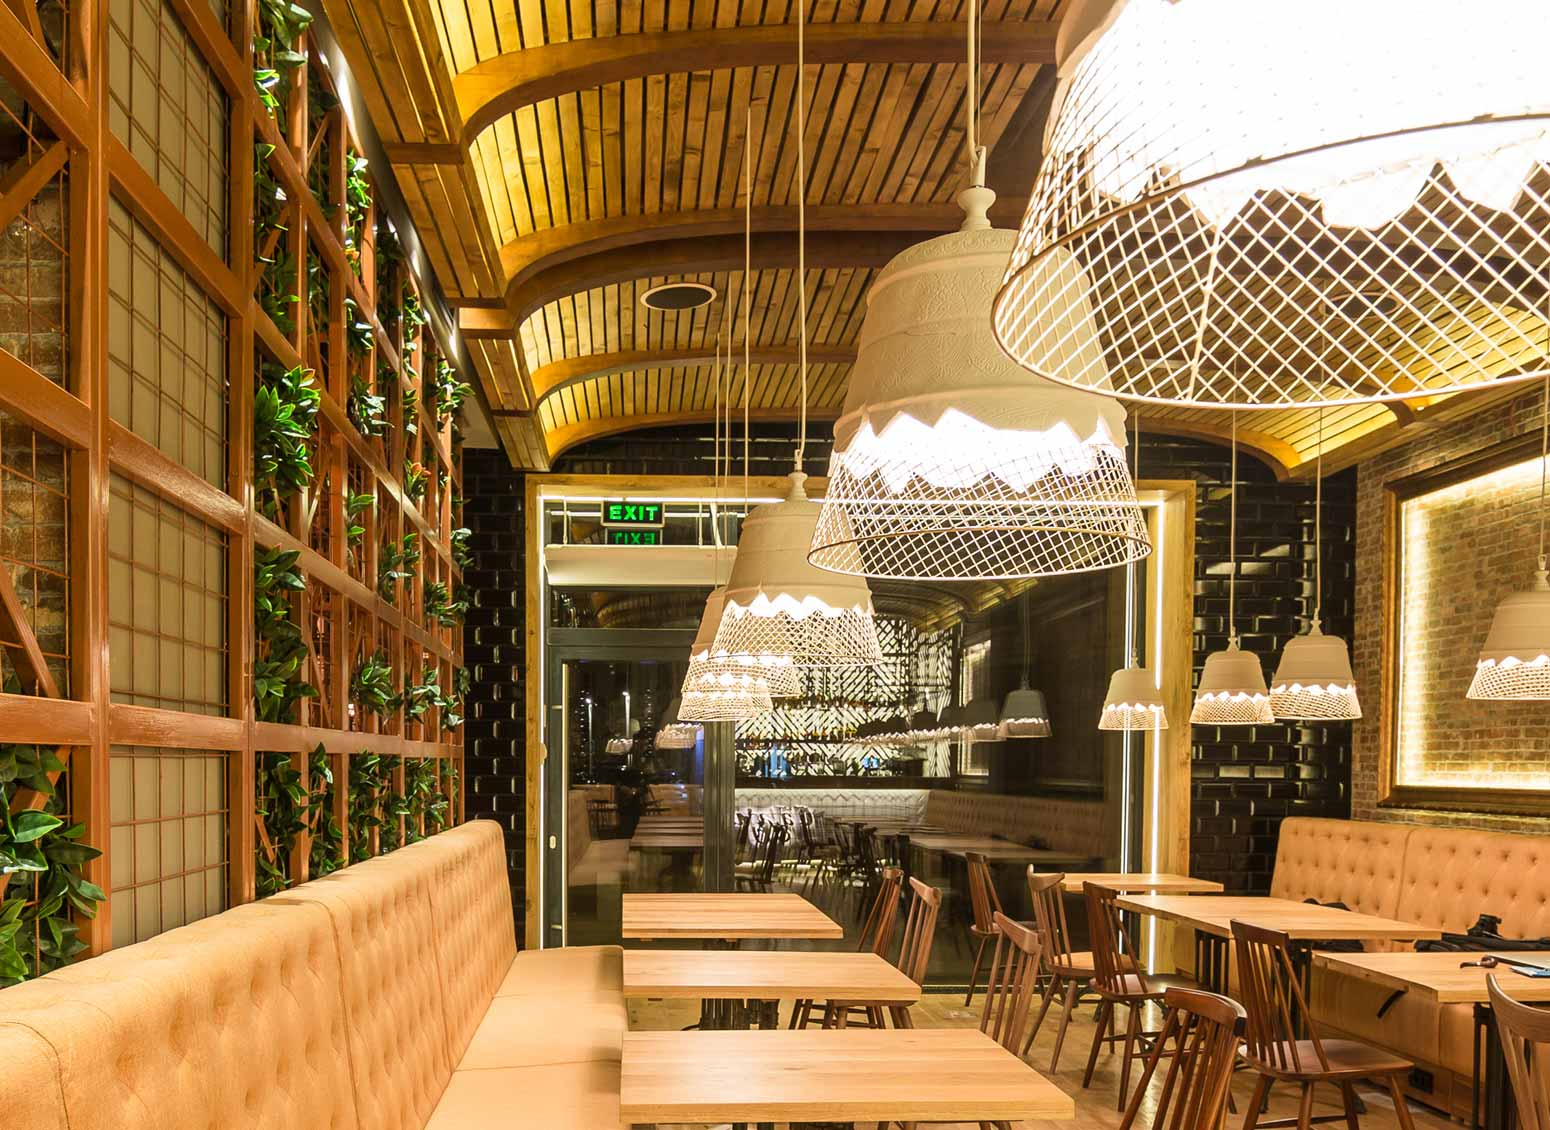 A Parigi, Karman illumina il ristorante Les Amis de Messina